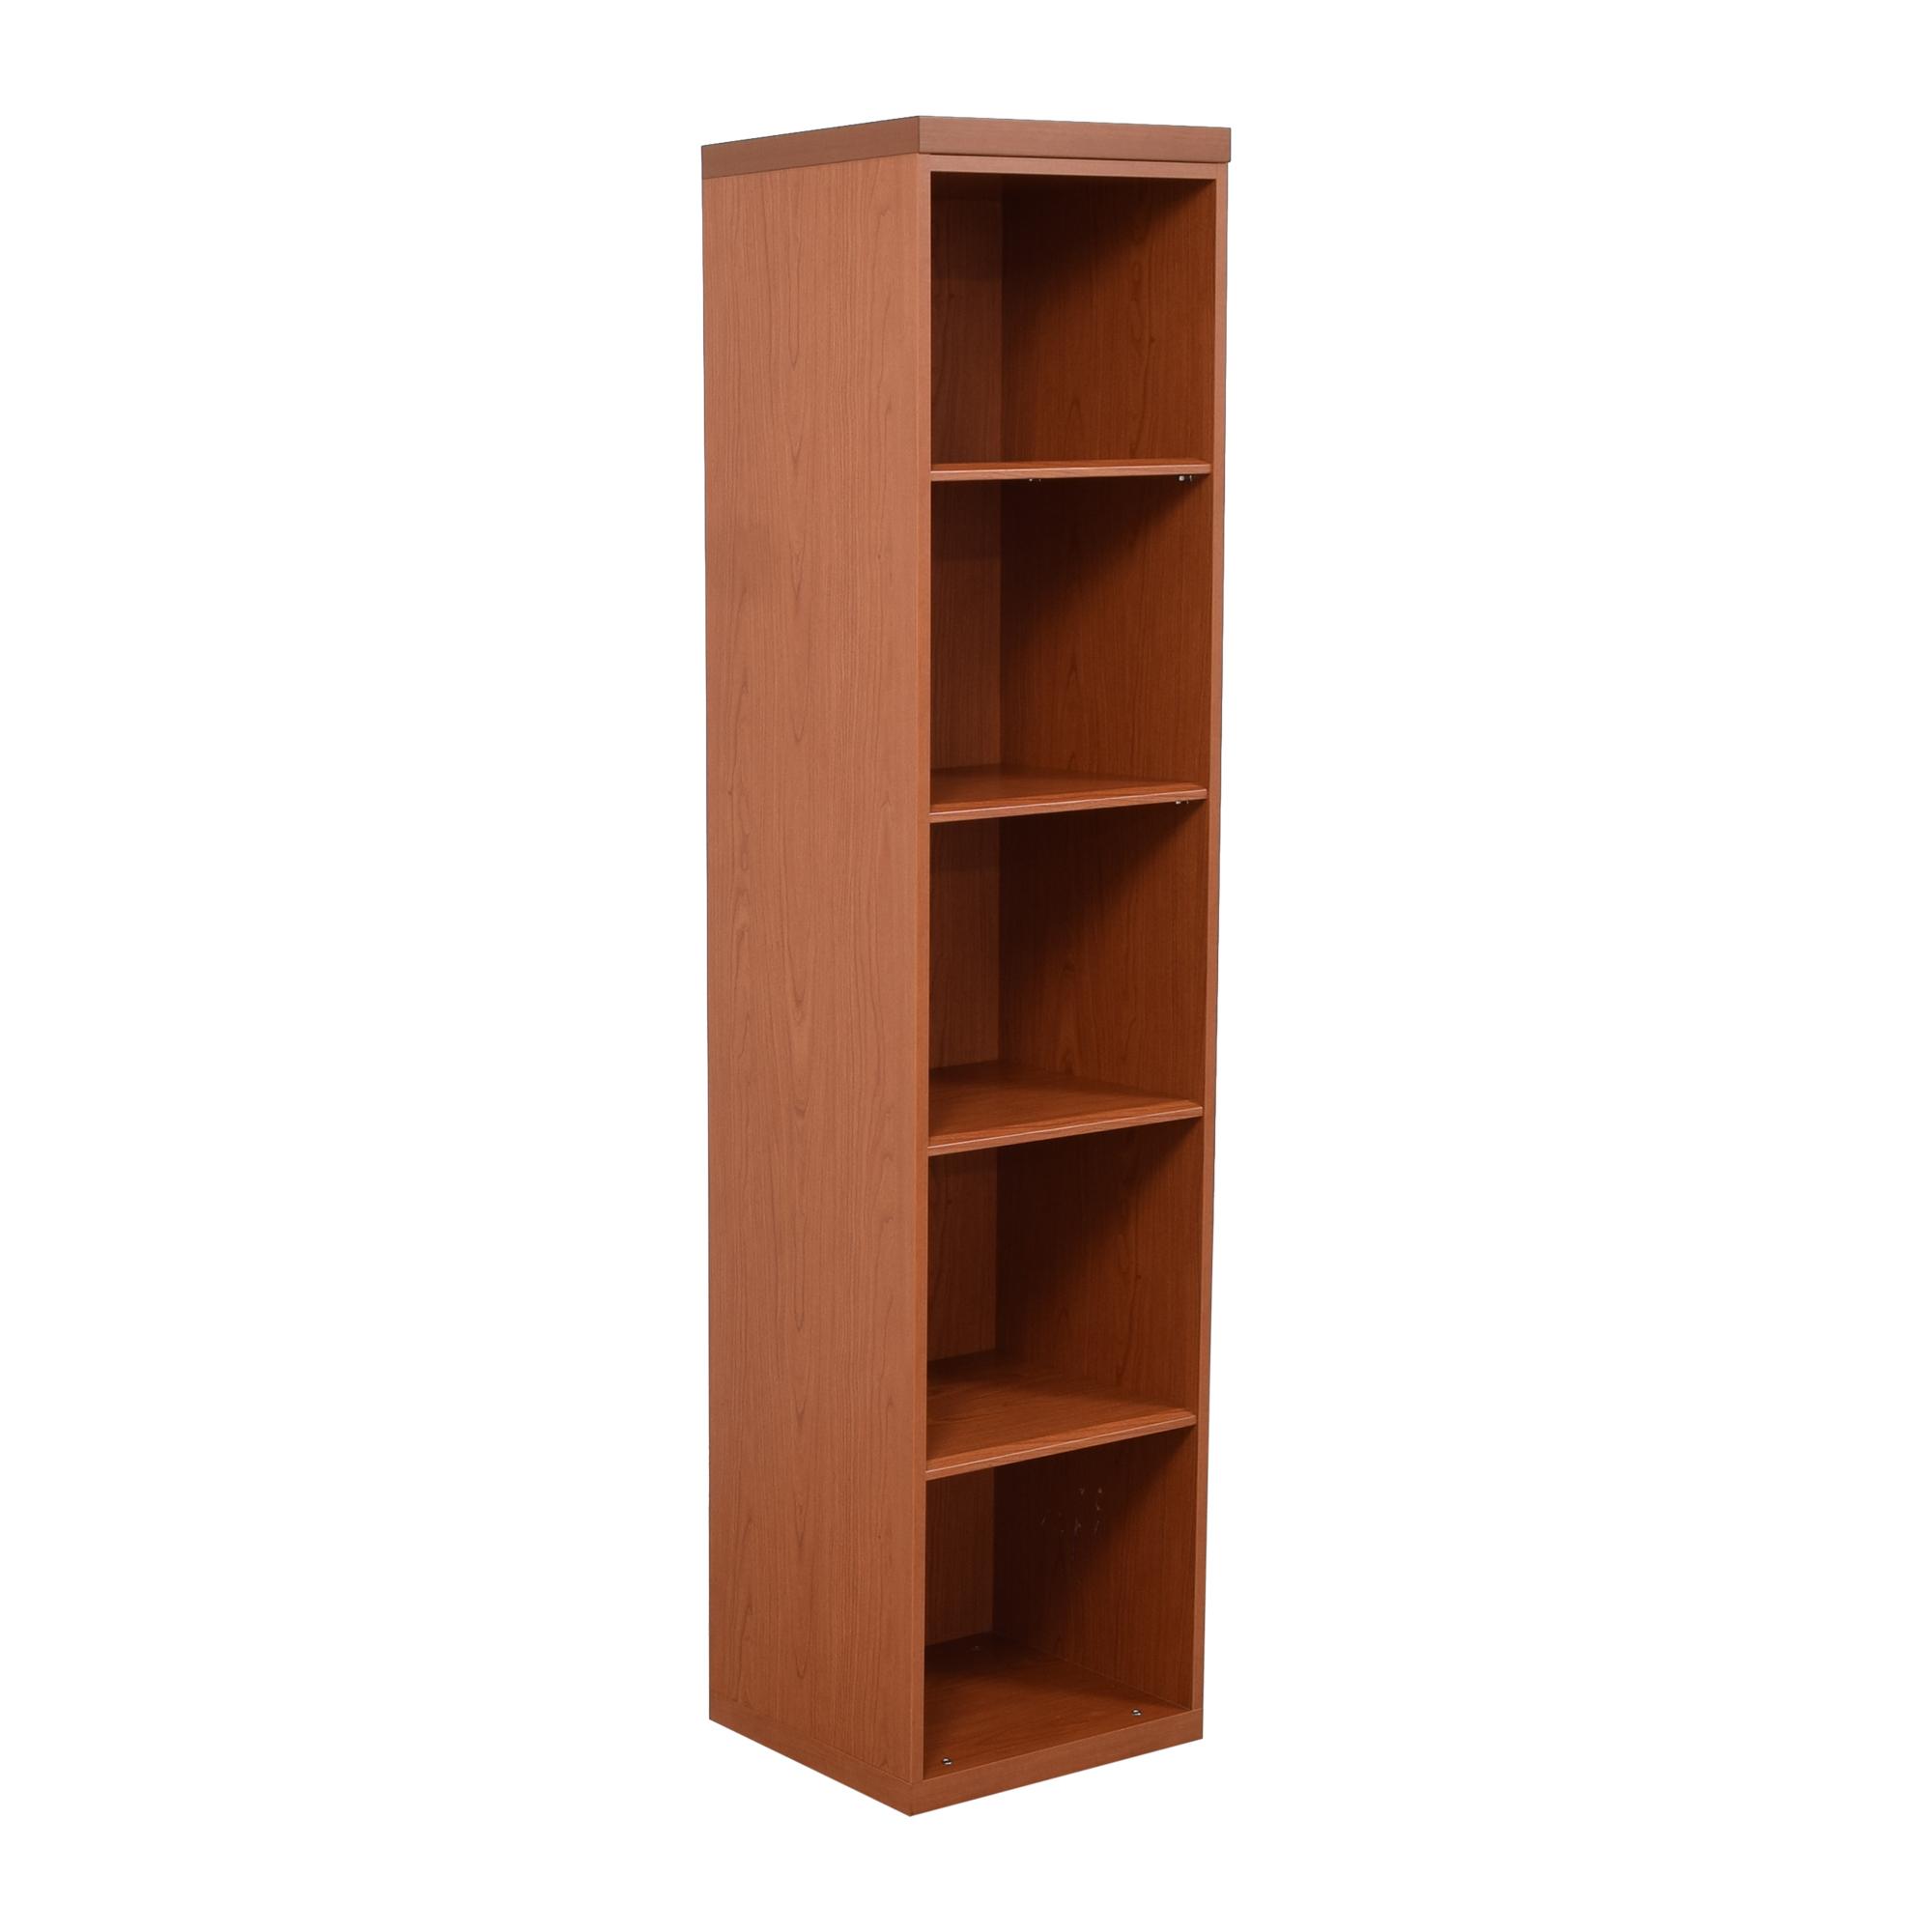 Maurice Villency Tall Bookcase / Storage